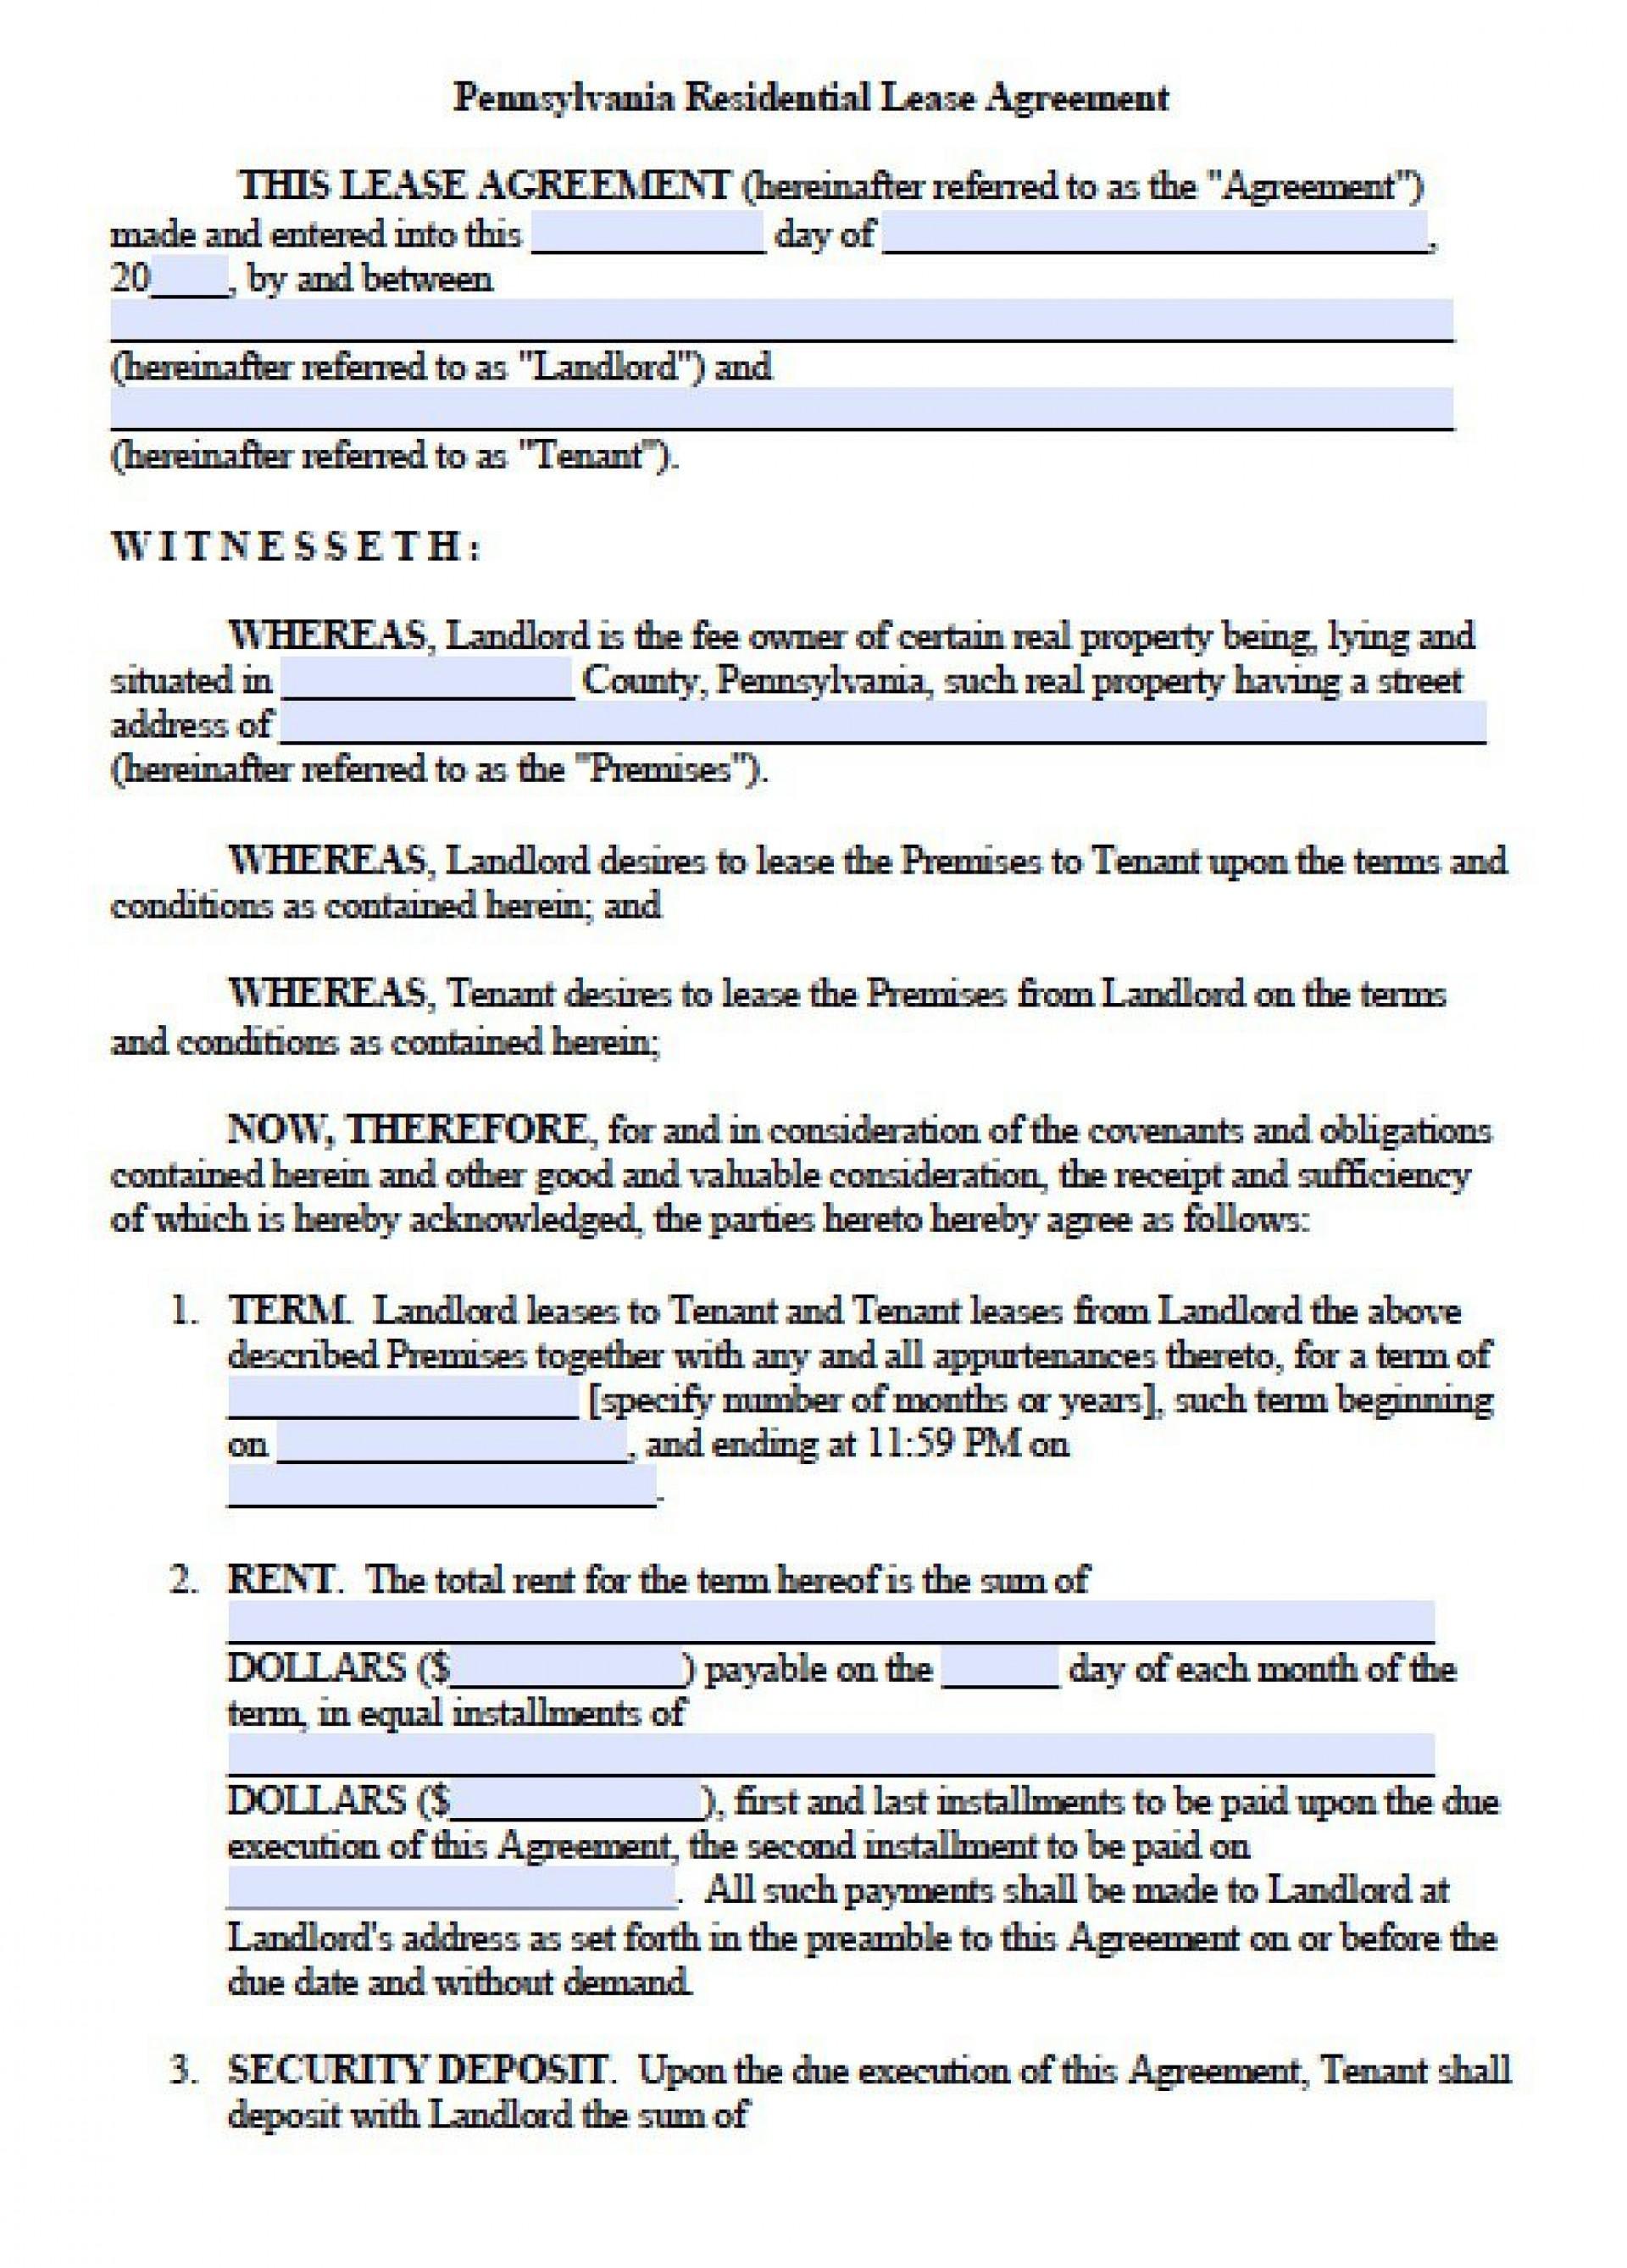 007 Rare Generic Rental Lease Agreement Image  Sample Ohio Md Illinoi1920